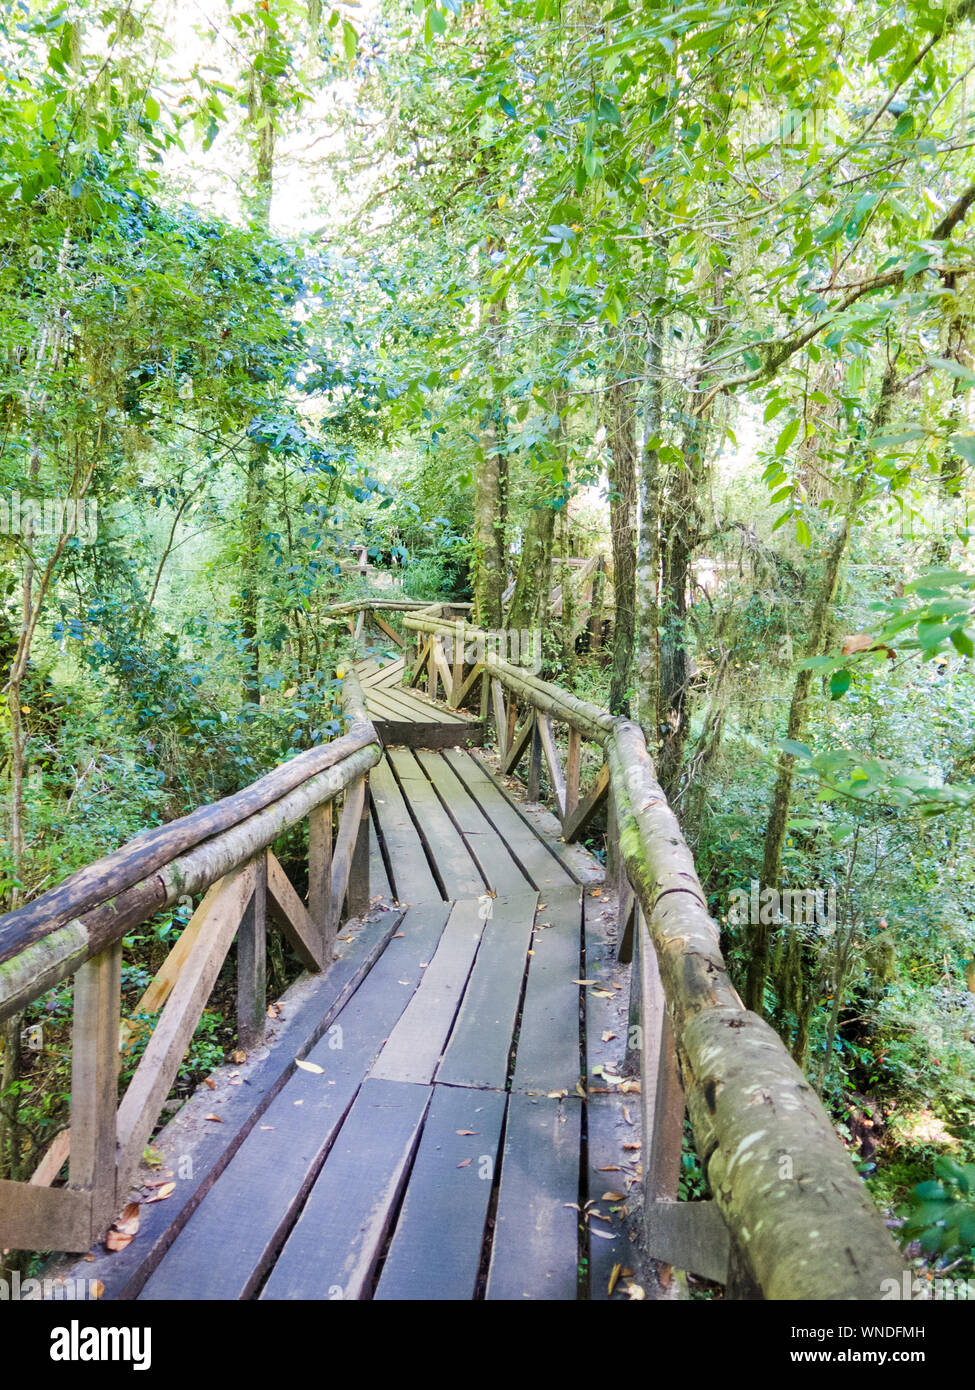 Wooden walkway in Huilo Huilo Biological Reserve, Los Rios Region, Chile. Stock Photo